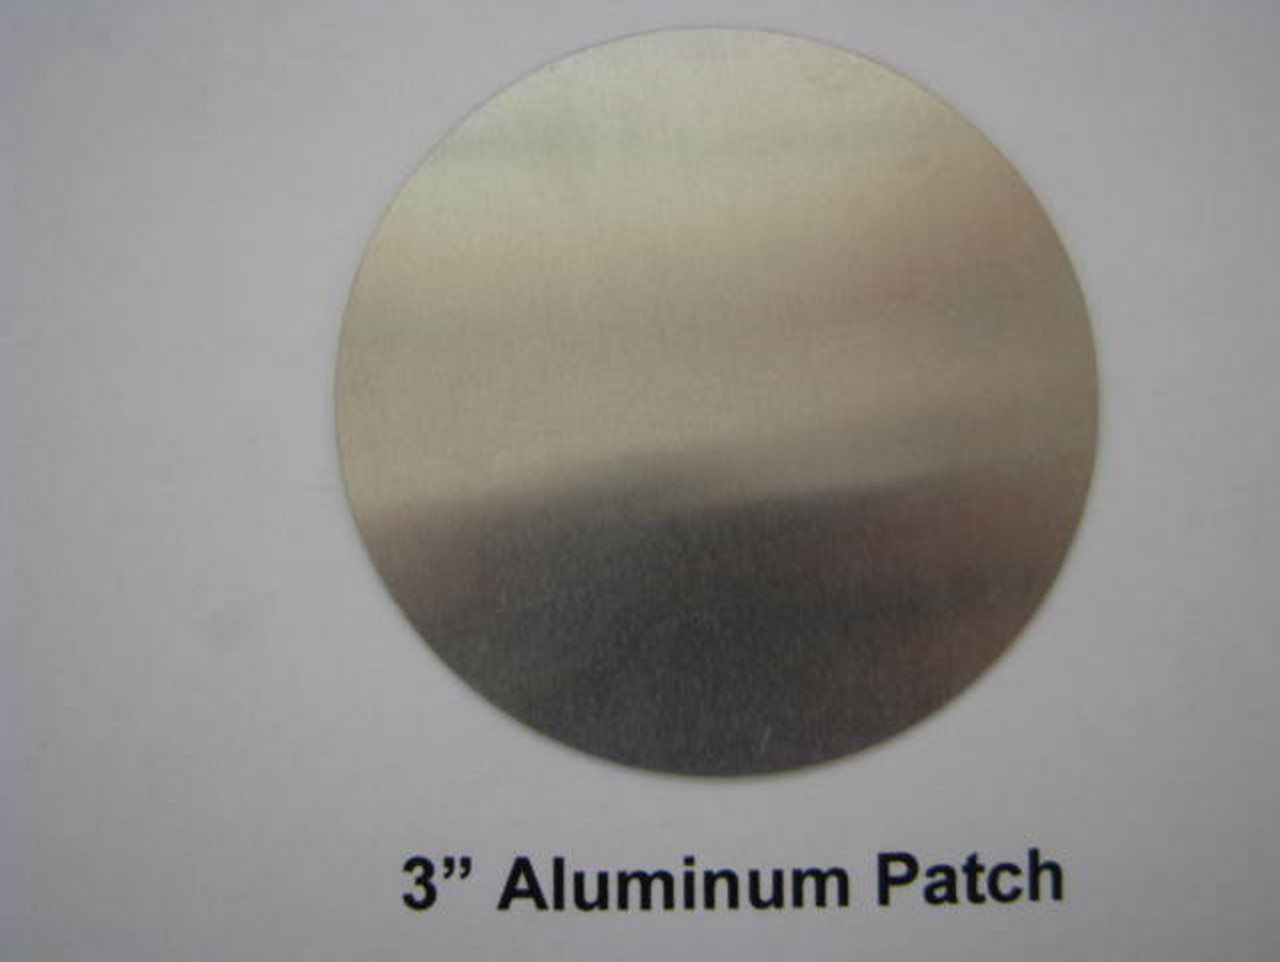 "Aluminum Round Patch - 3"" -(CBP003) FRONT VIEW"